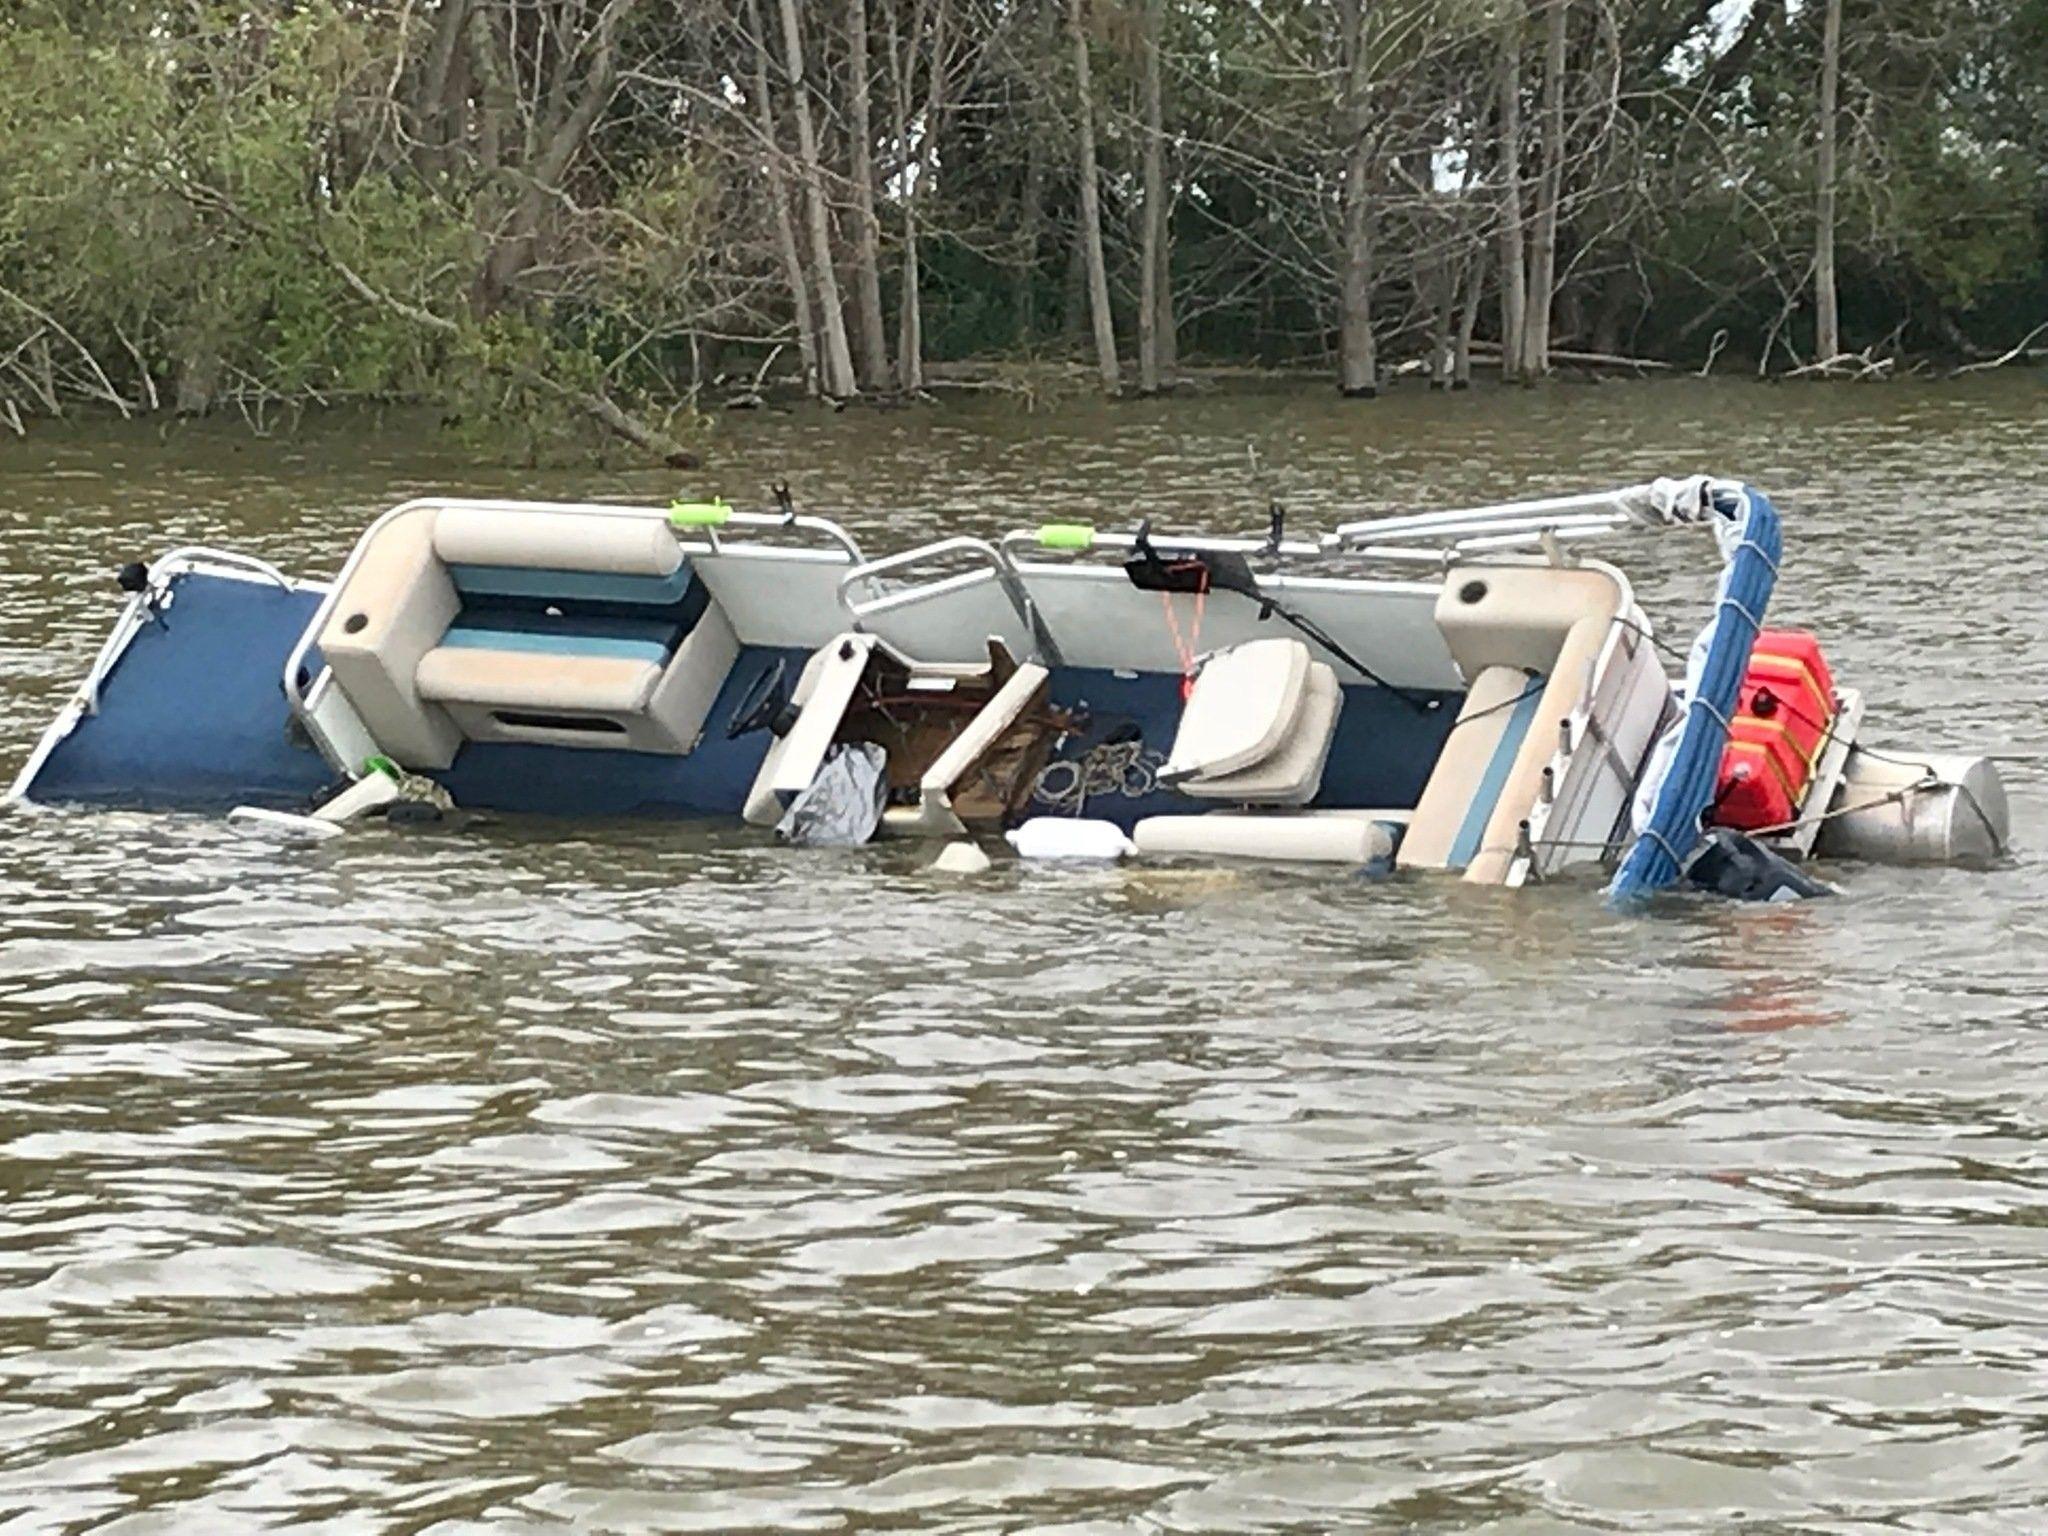 Why Do Pontoon Boats Sink? in 2020 Pontoon boat decor